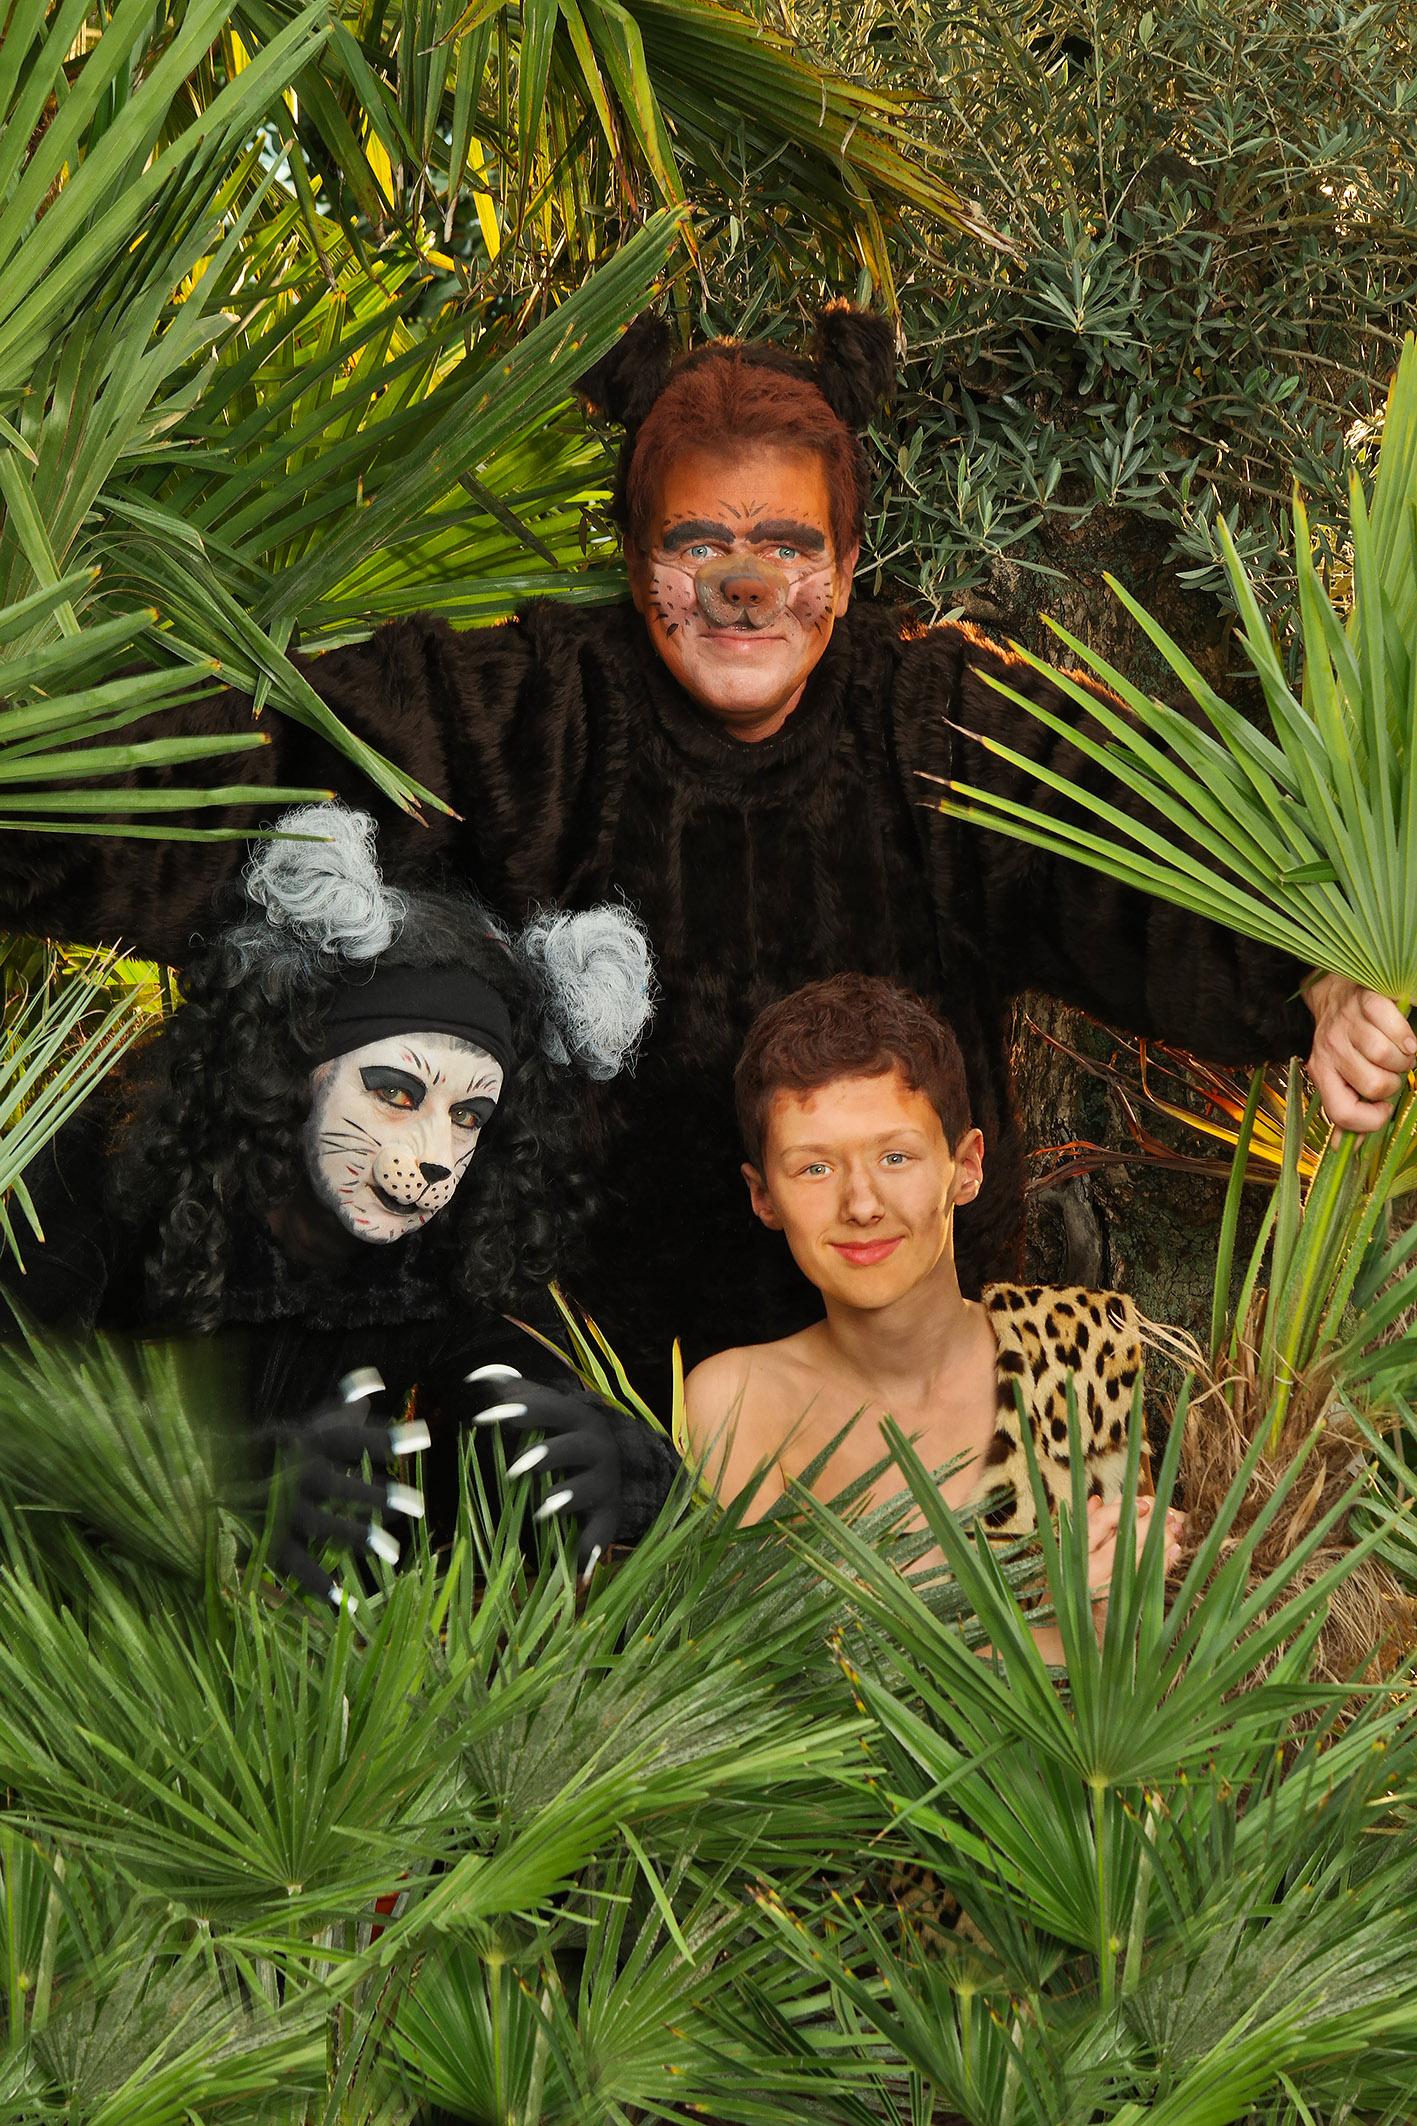 Dschungel Buch